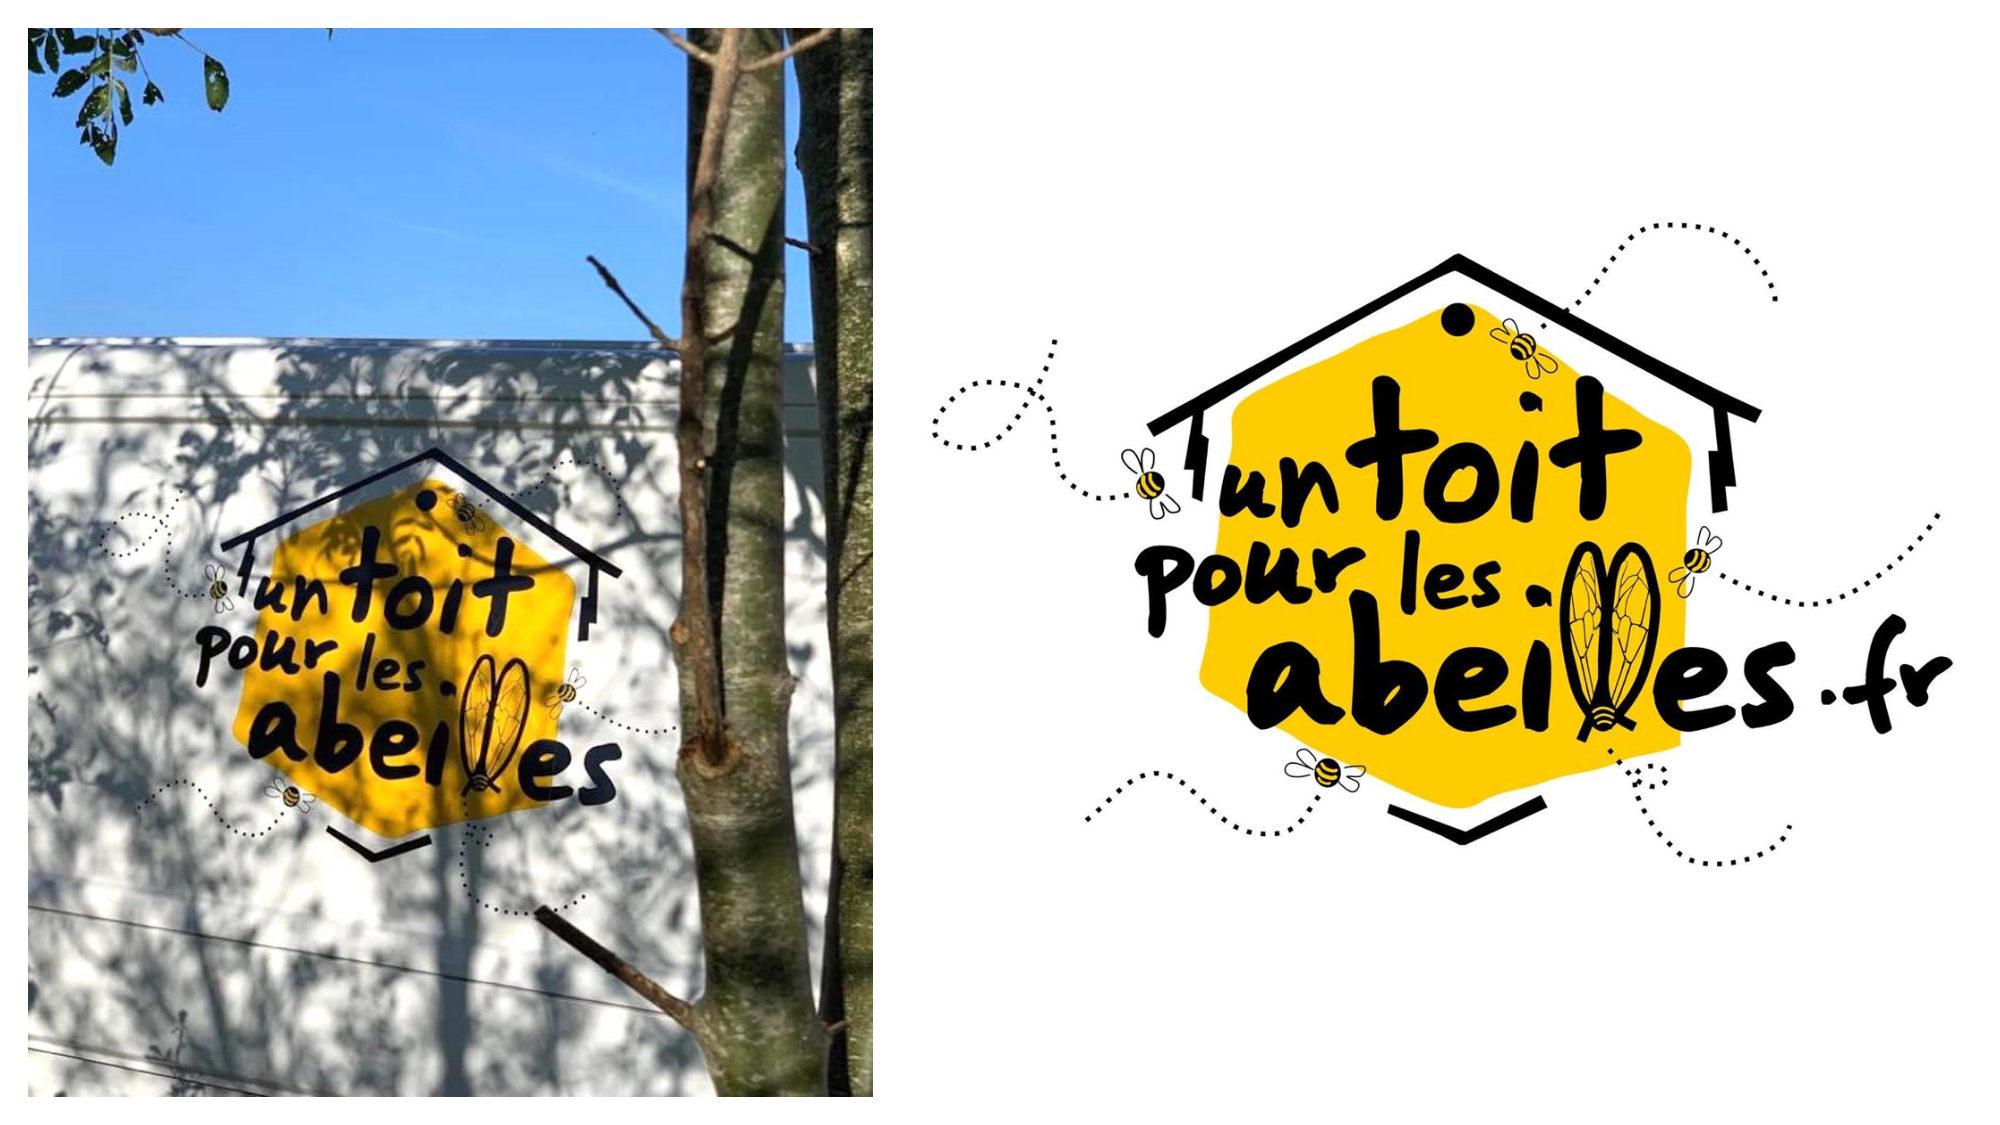 The yellow hexagon-shaped logo of Un toit pour les abeilles, an association that promotes beekeeping in Paris.